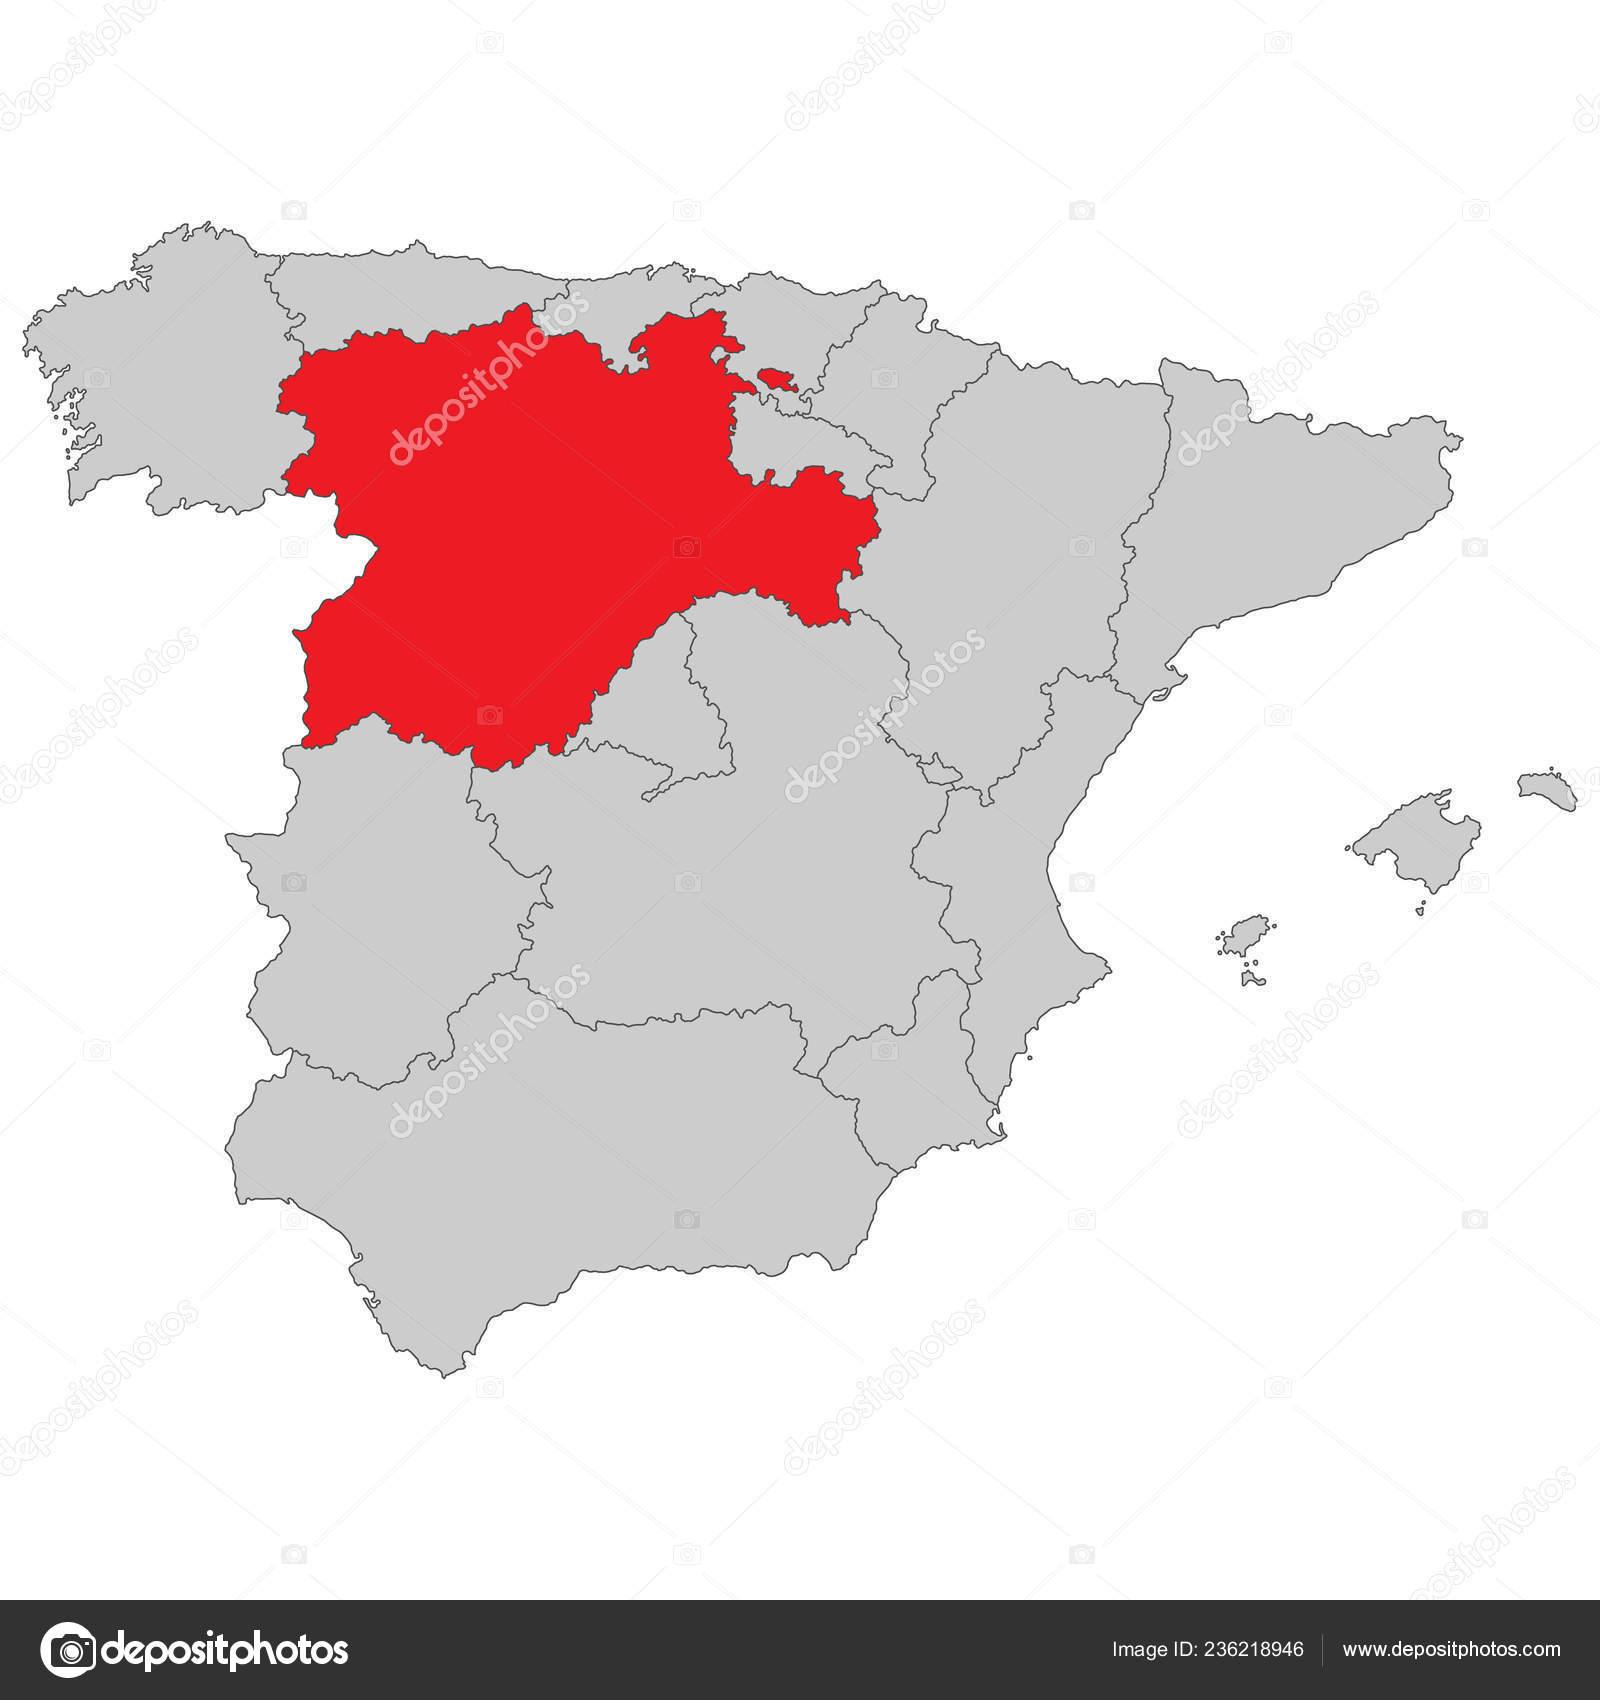 Map Of Spain Leon.Spain Map Spain Castile Leon High Detailed Stock Vector C Ii